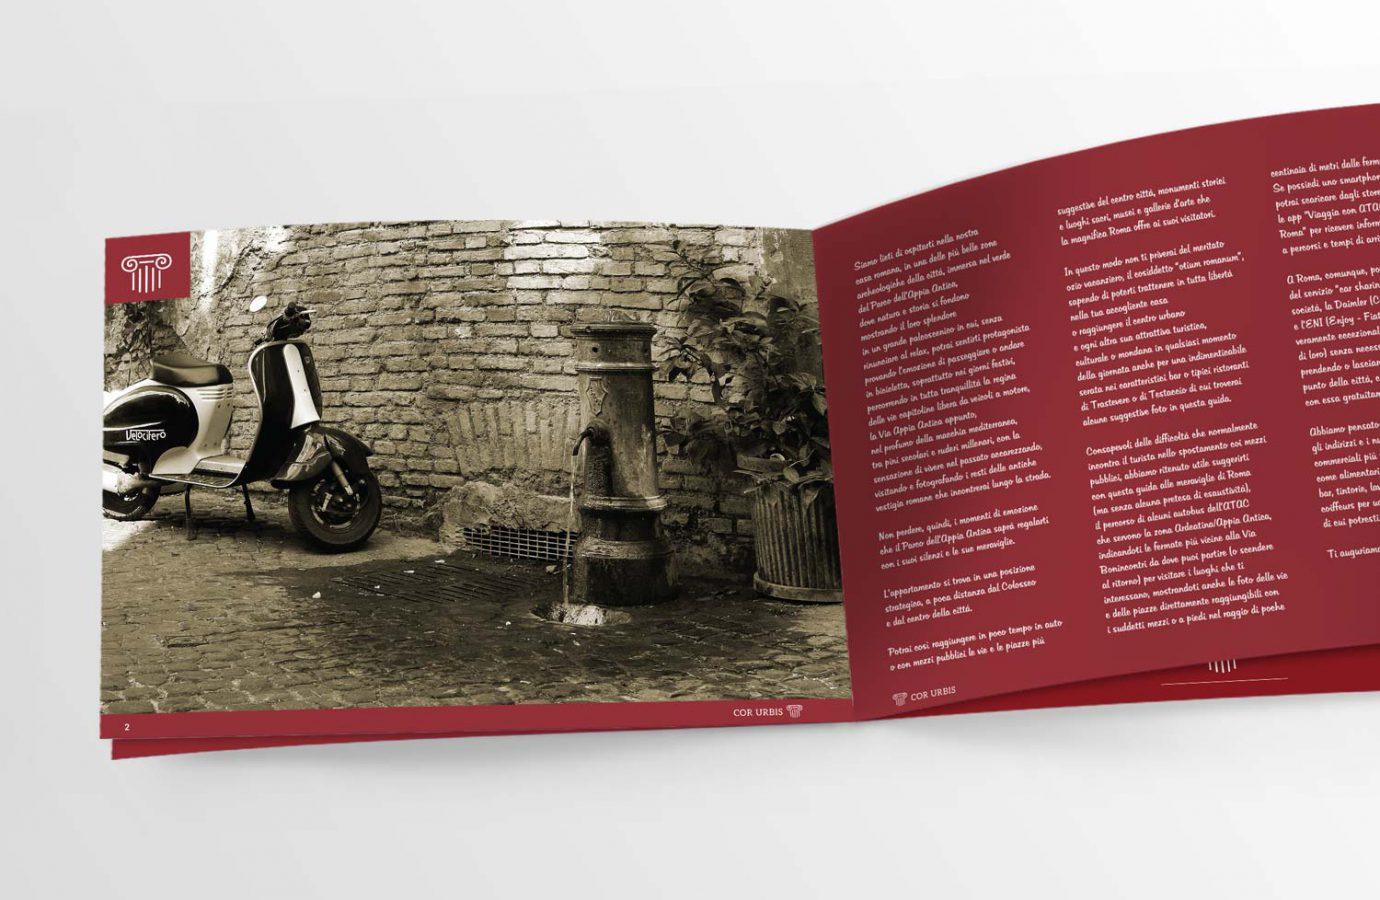 Design di brochure turistica cartacea per casa vacanze realizzata da WillBe